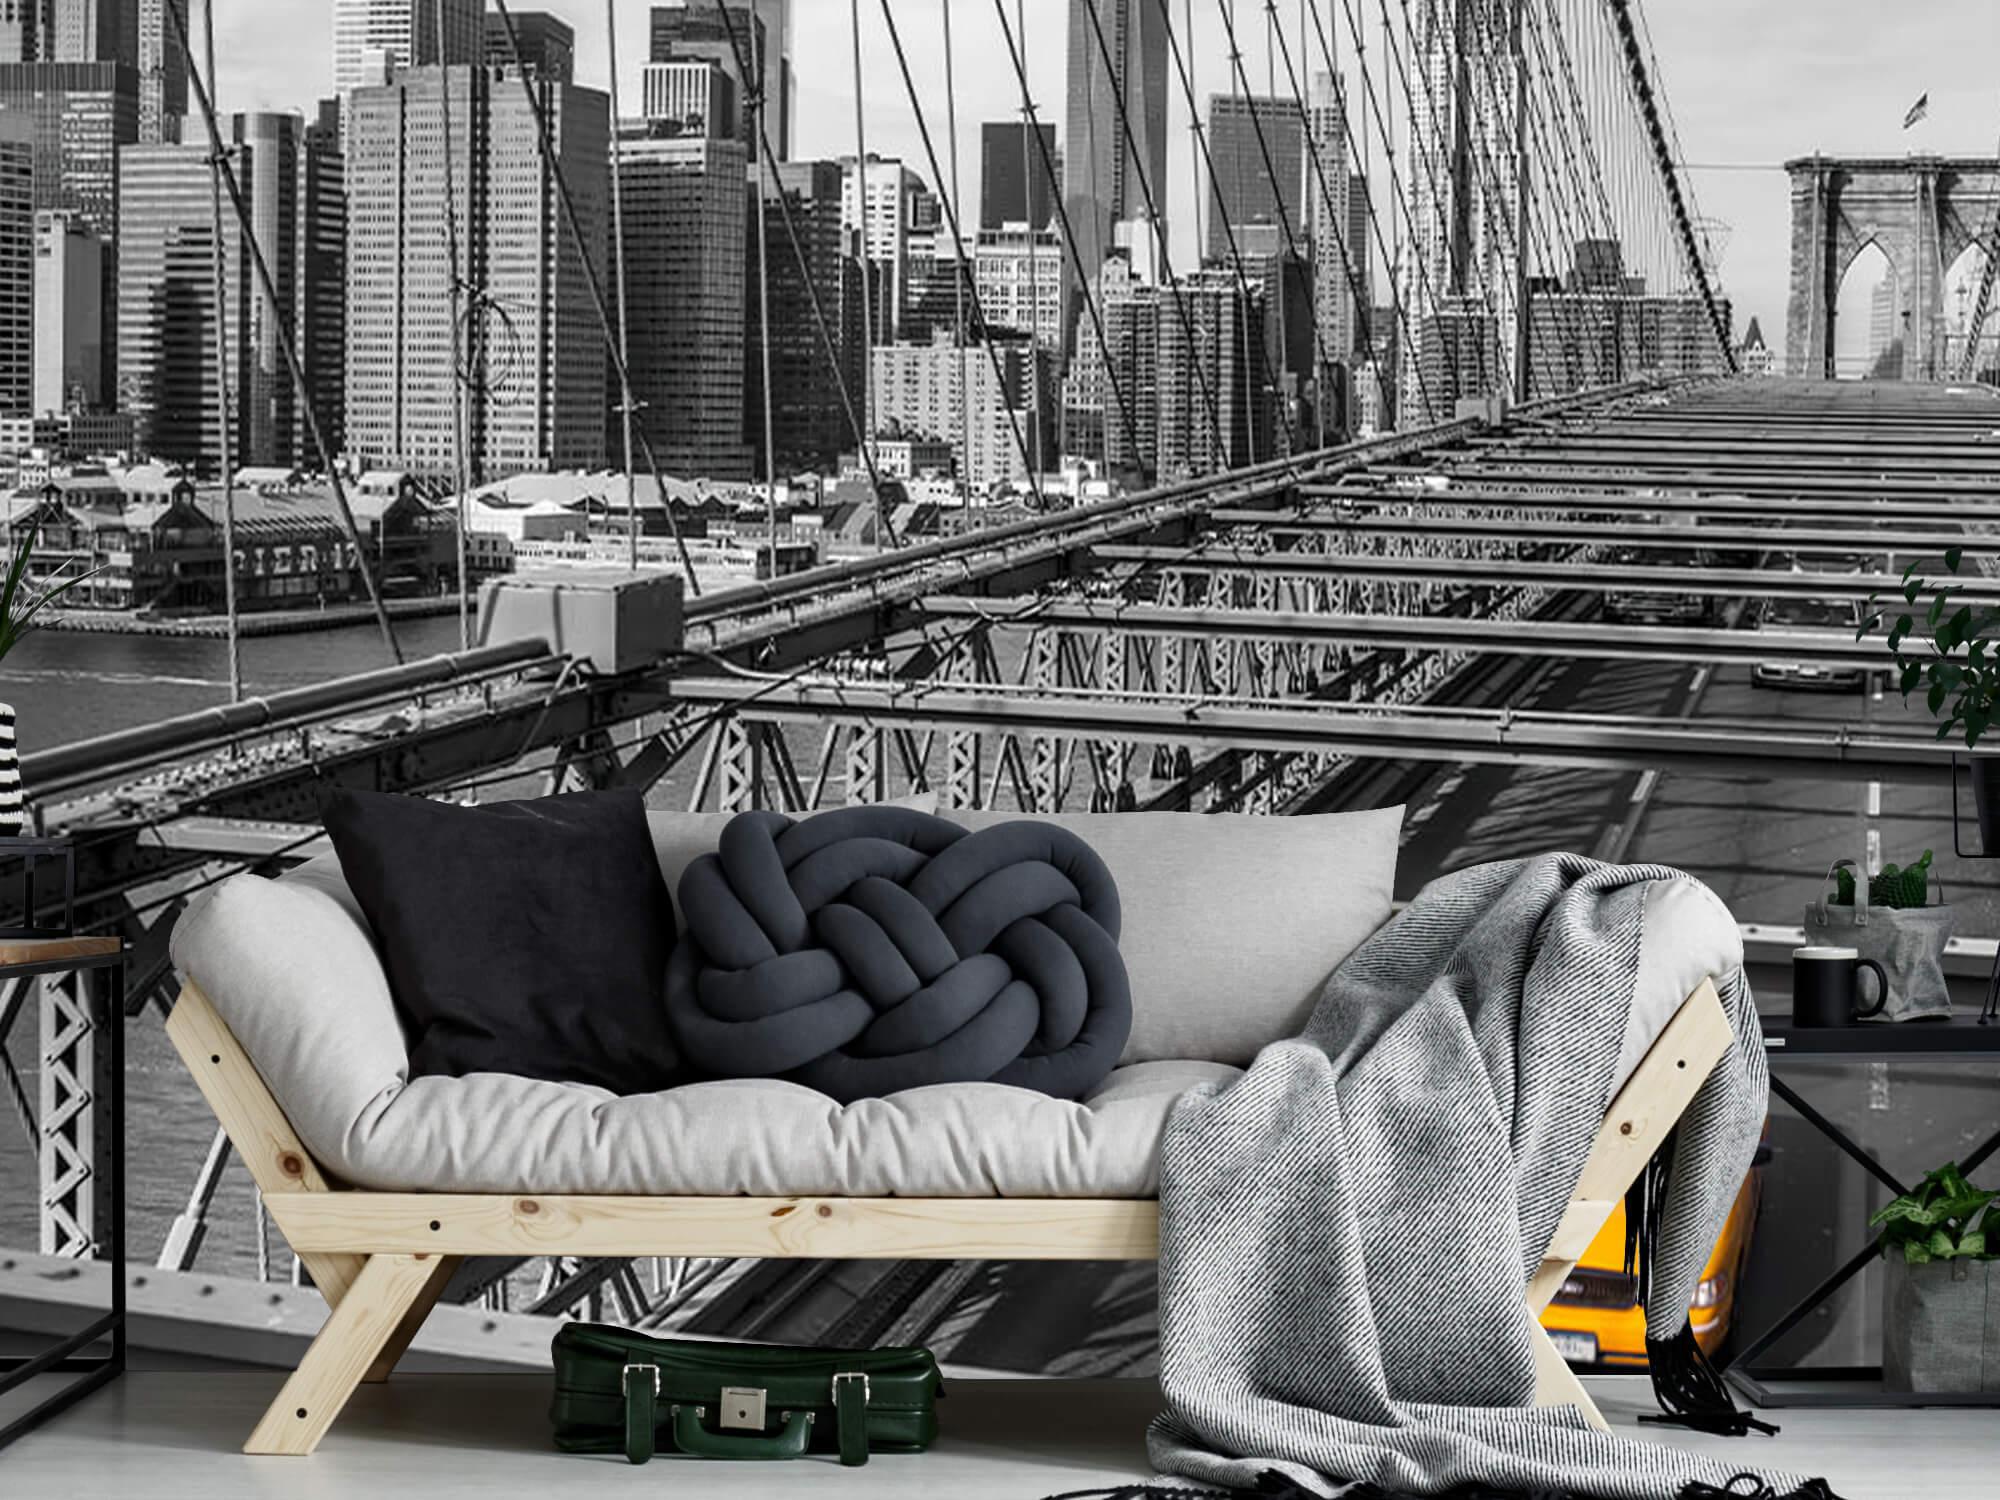 En taxi över Brooklyn Bridge 7